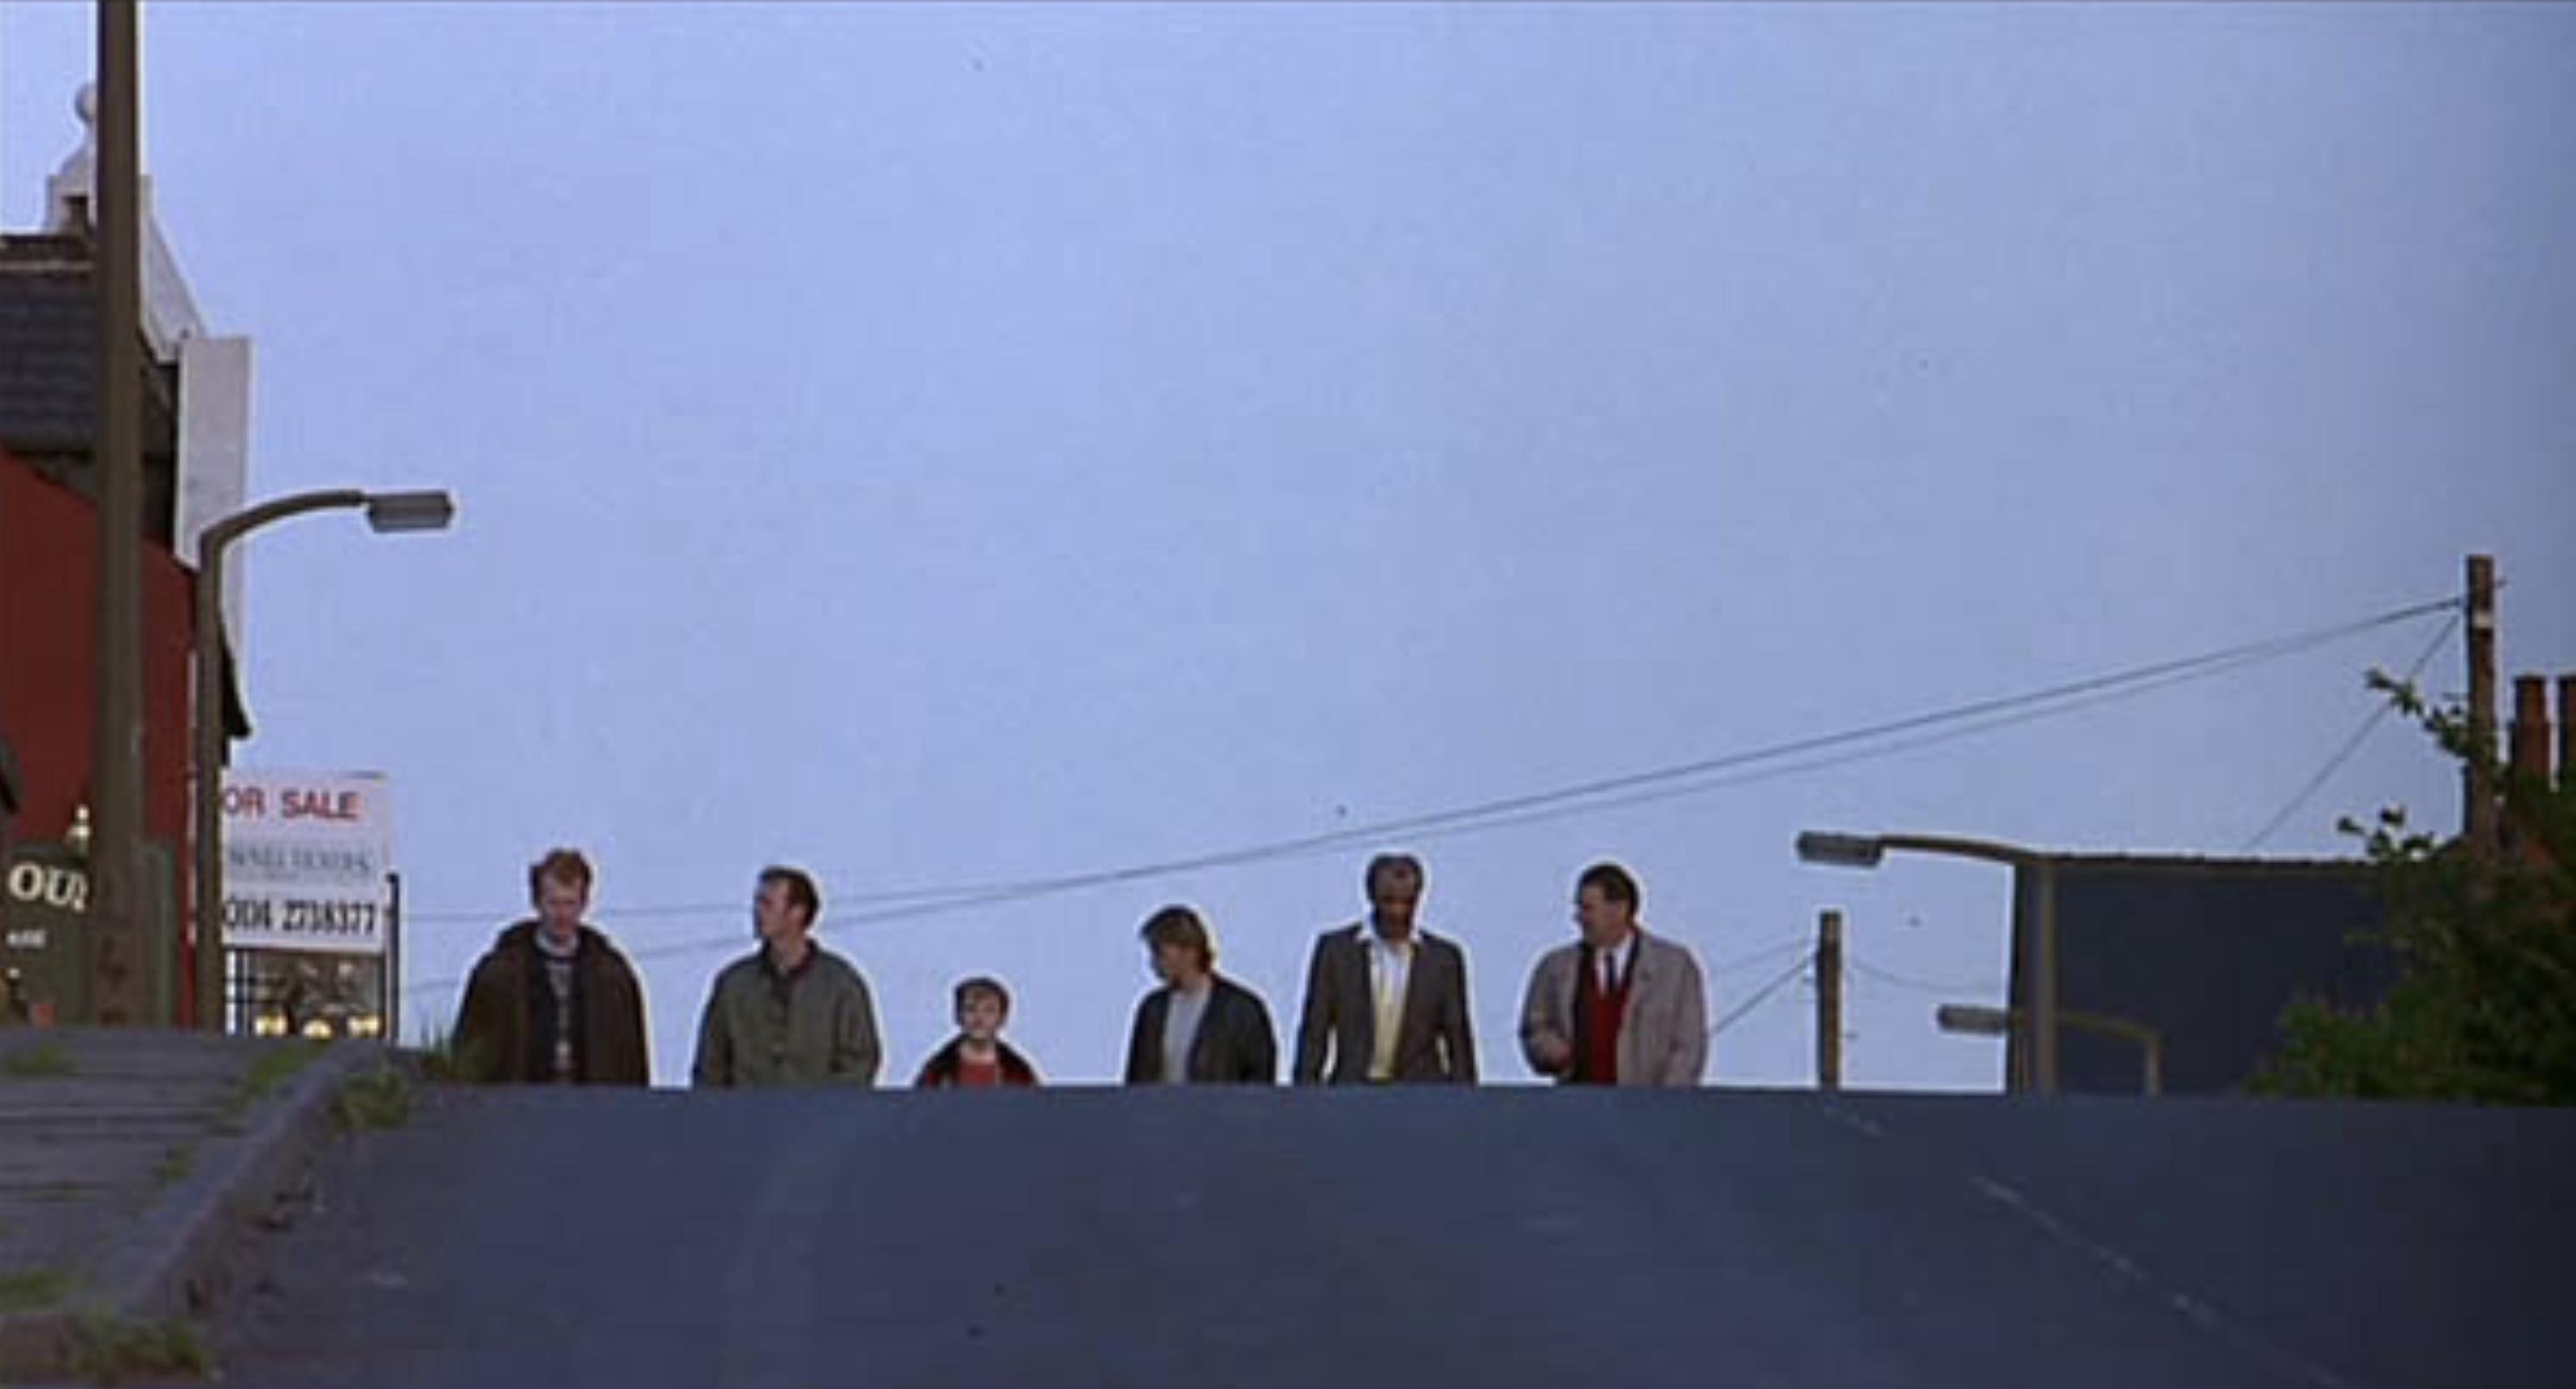 Shirland Lane Sheffield - The Full Monty Filming Location